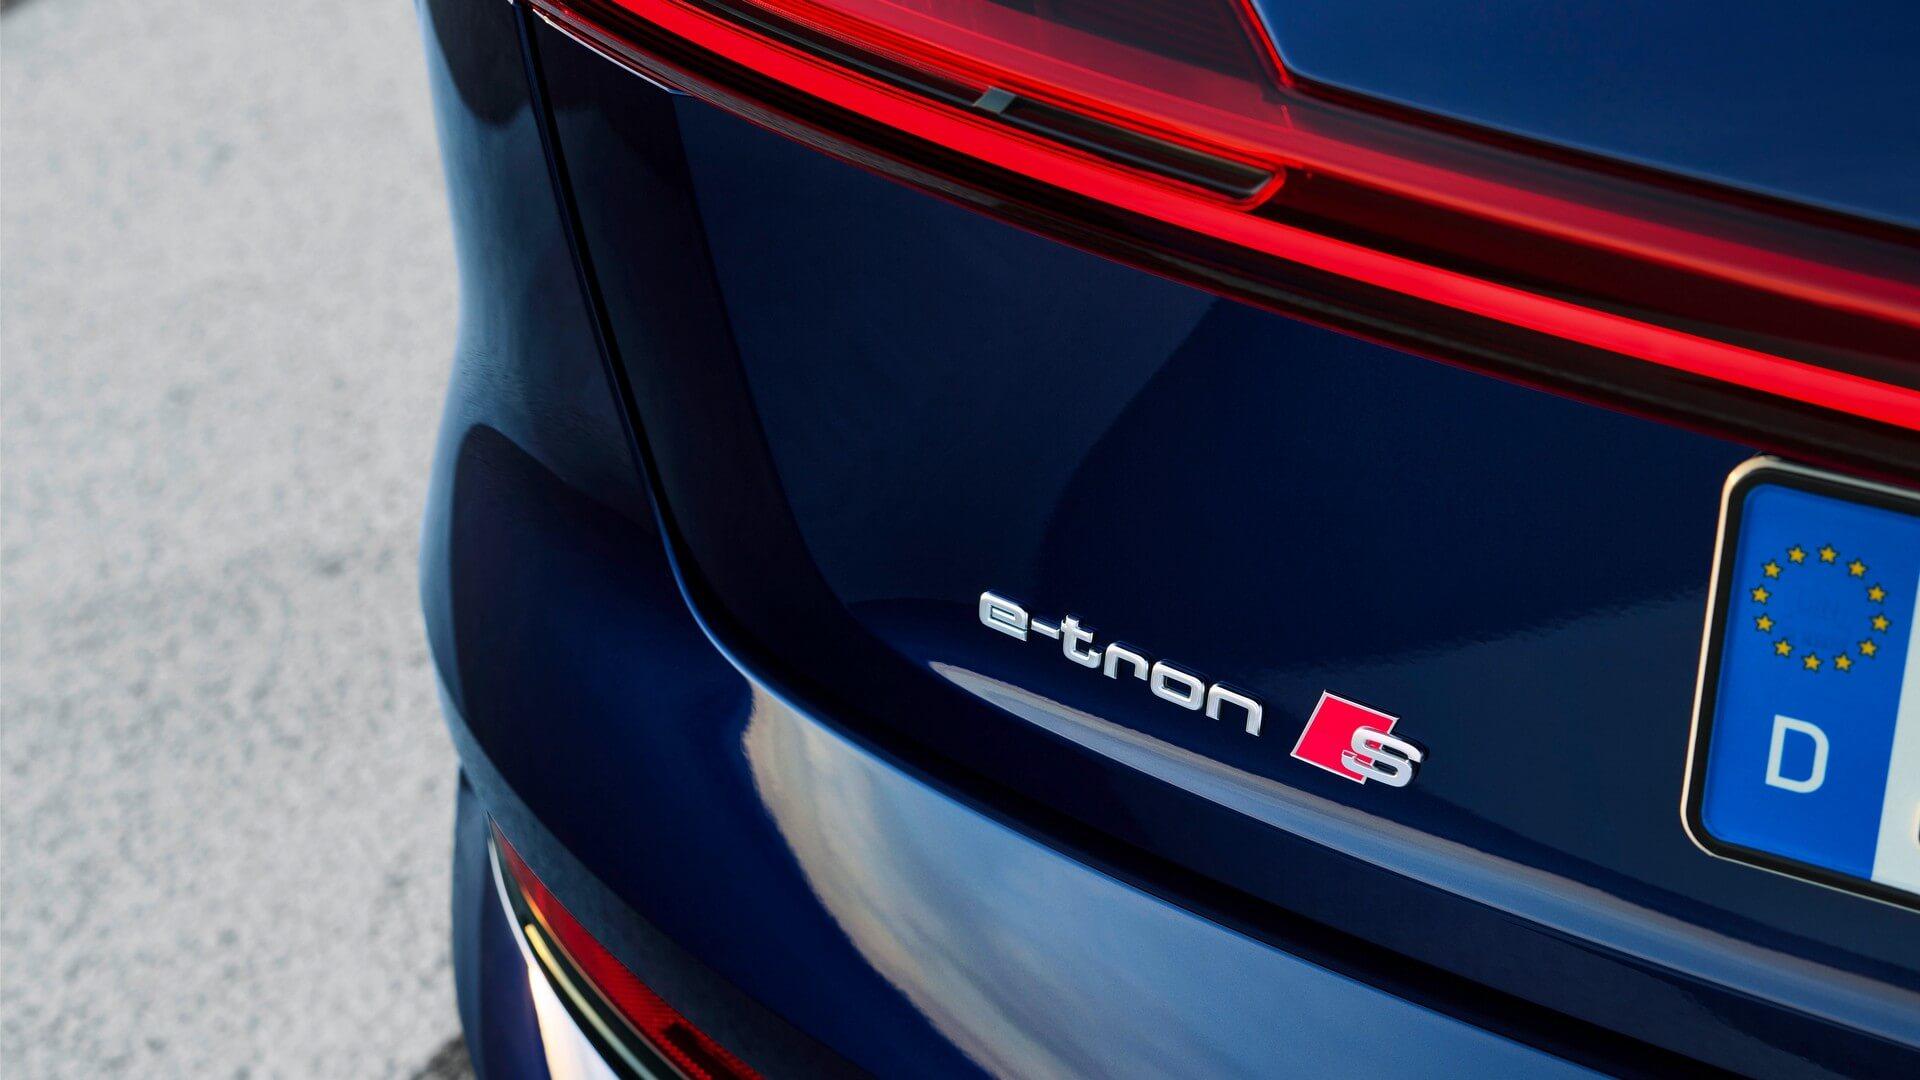 Audi-E-Tron-S-and-E-Tron-S-Sportback-2020-120